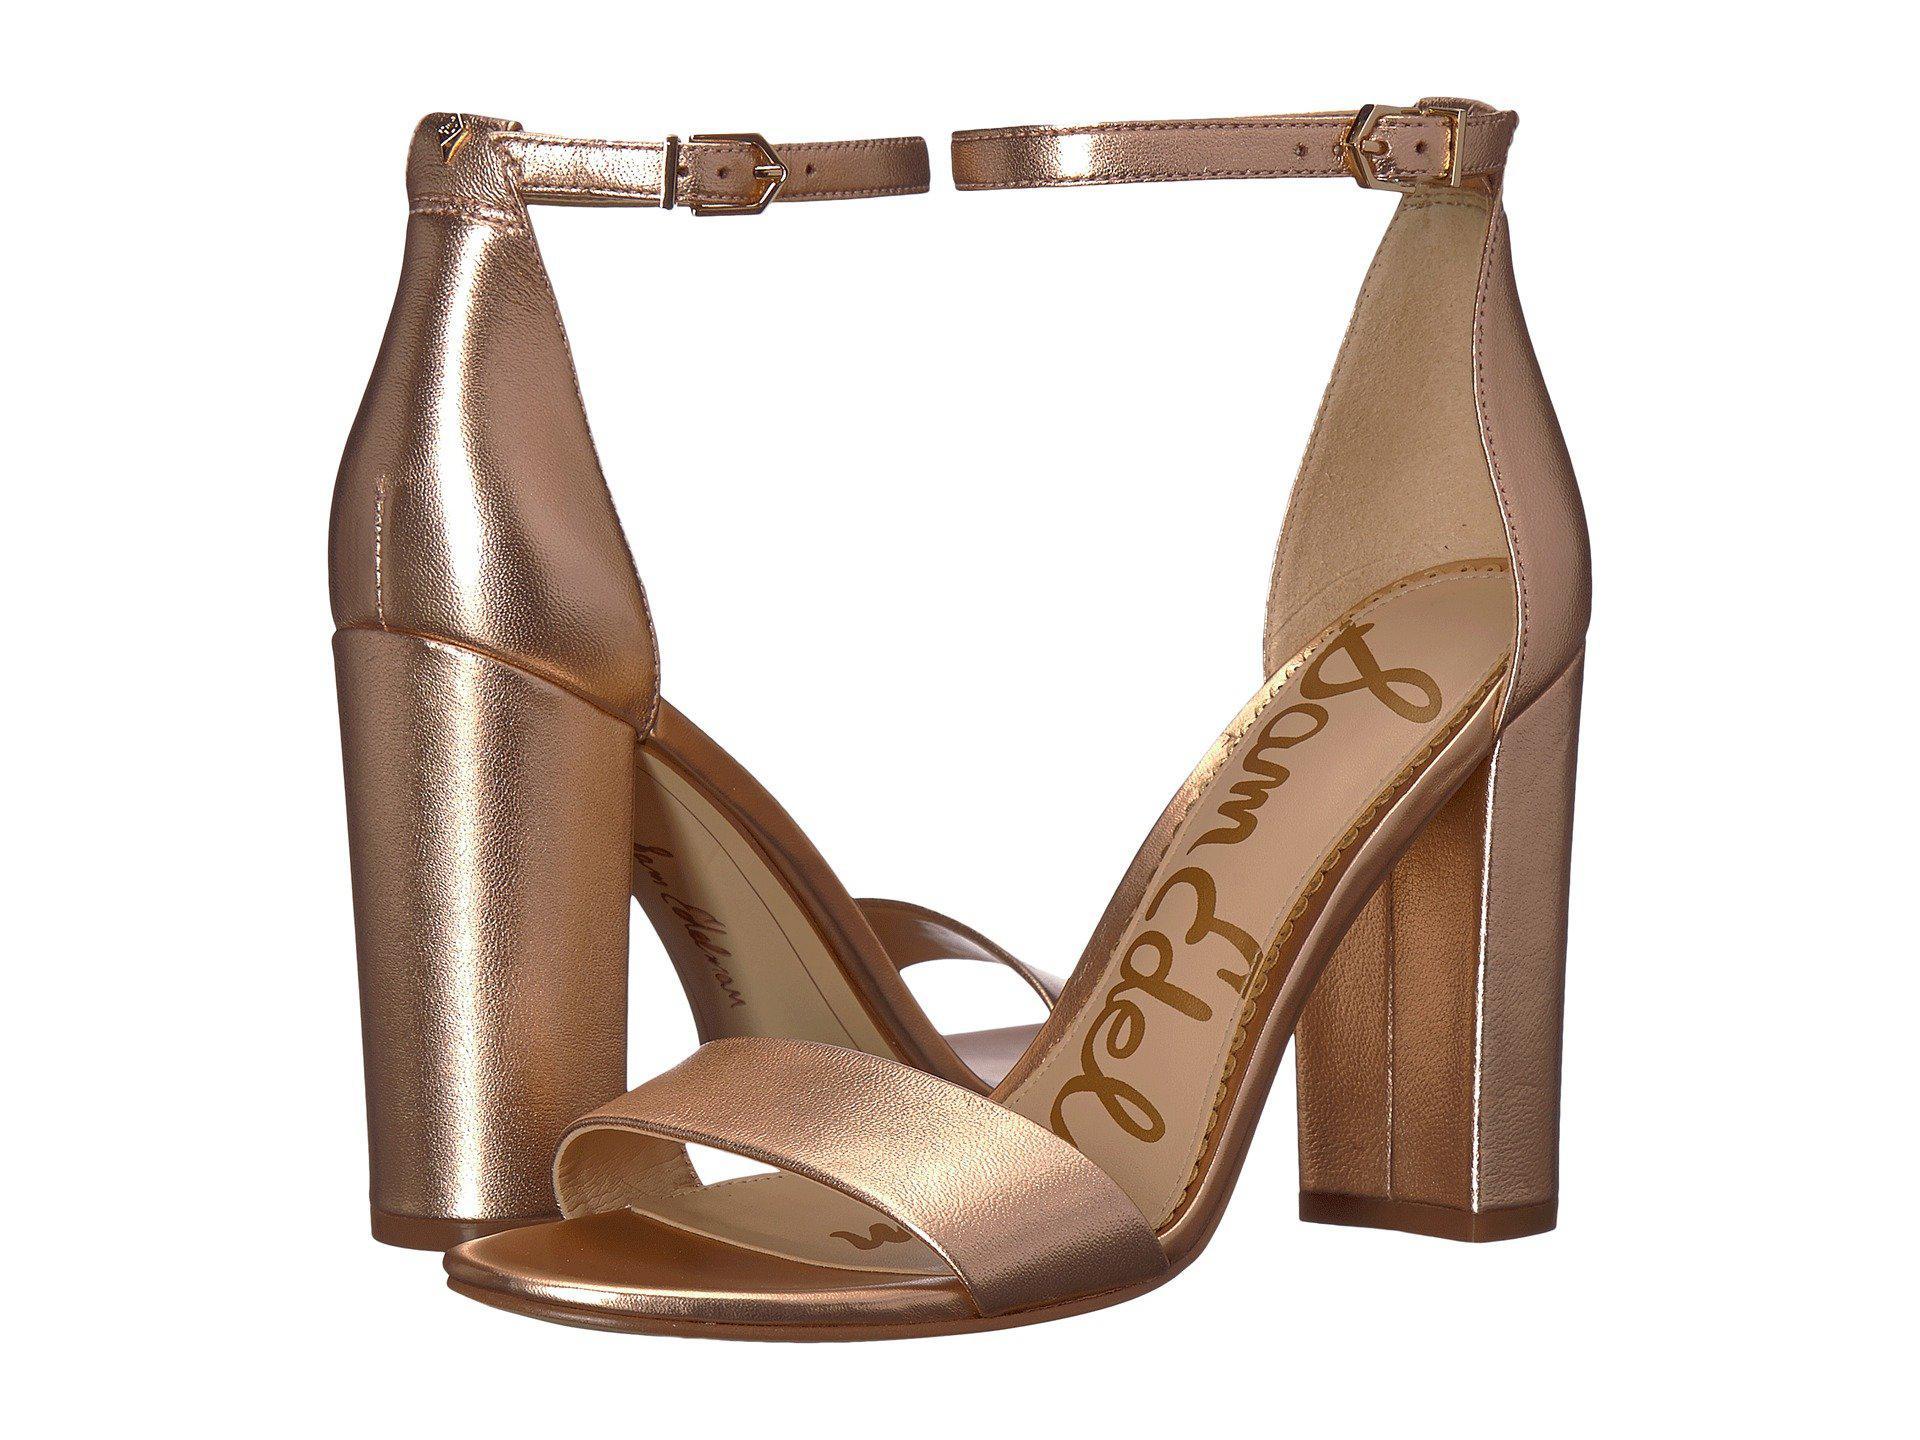 9bfce527371a Lyst - Sam Edelman Yaro Ankle Strap Sandal Heel (silver) Women s ...